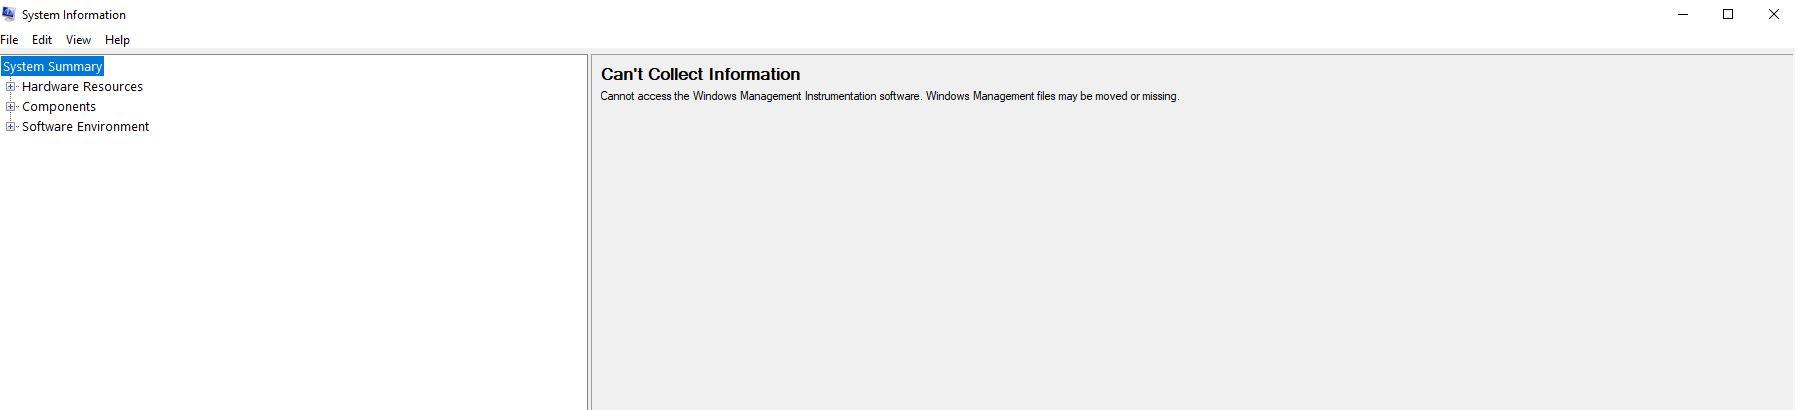 System Information not populating, System Information application